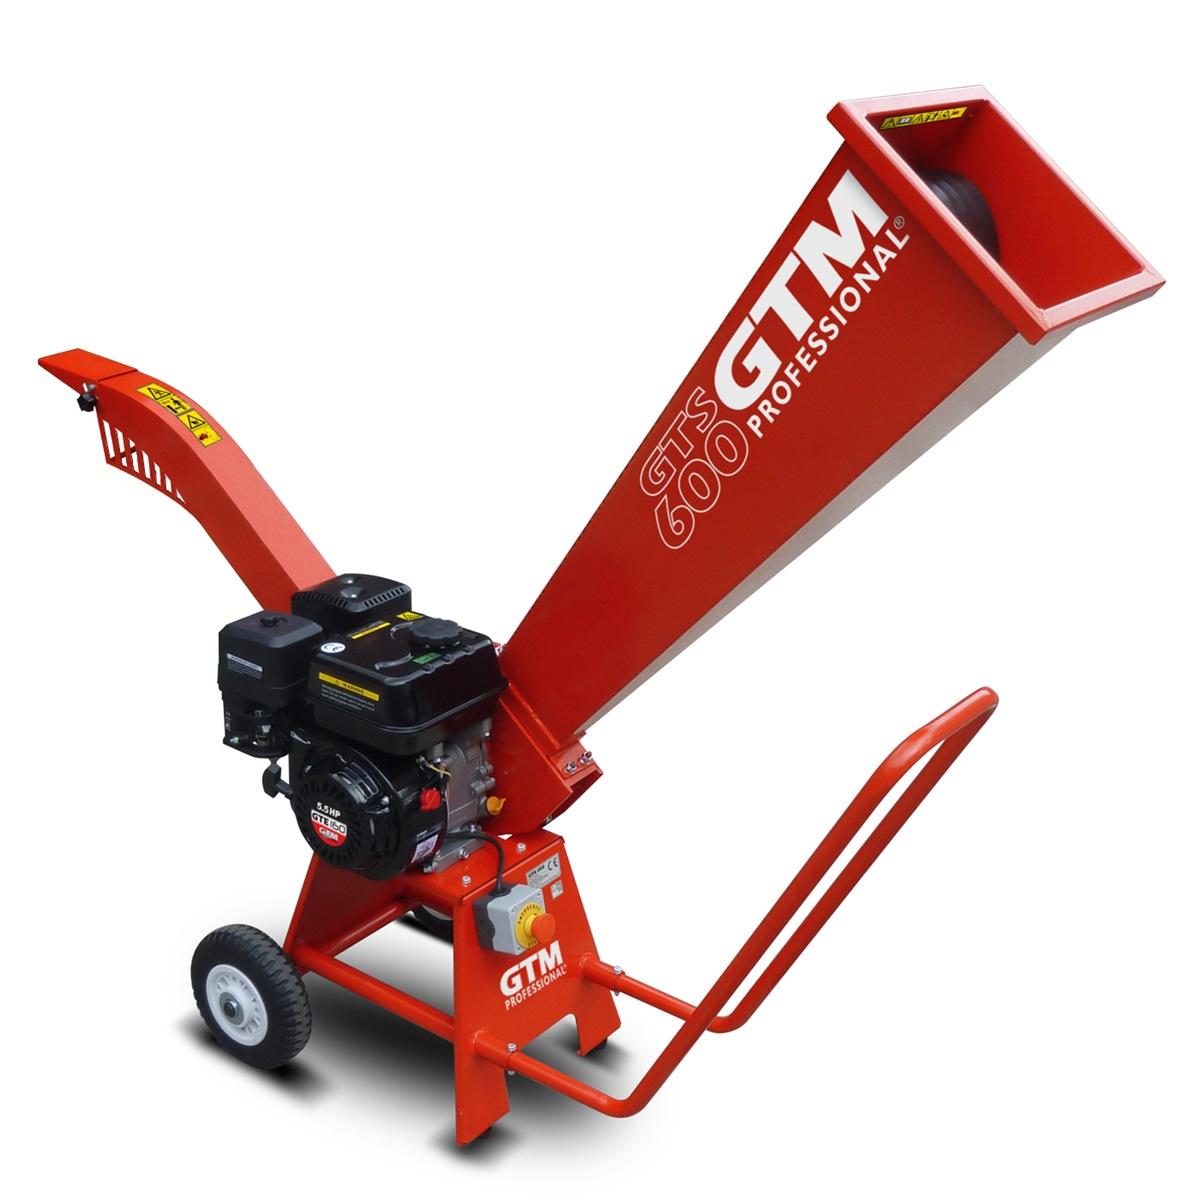 GTM GTS 600